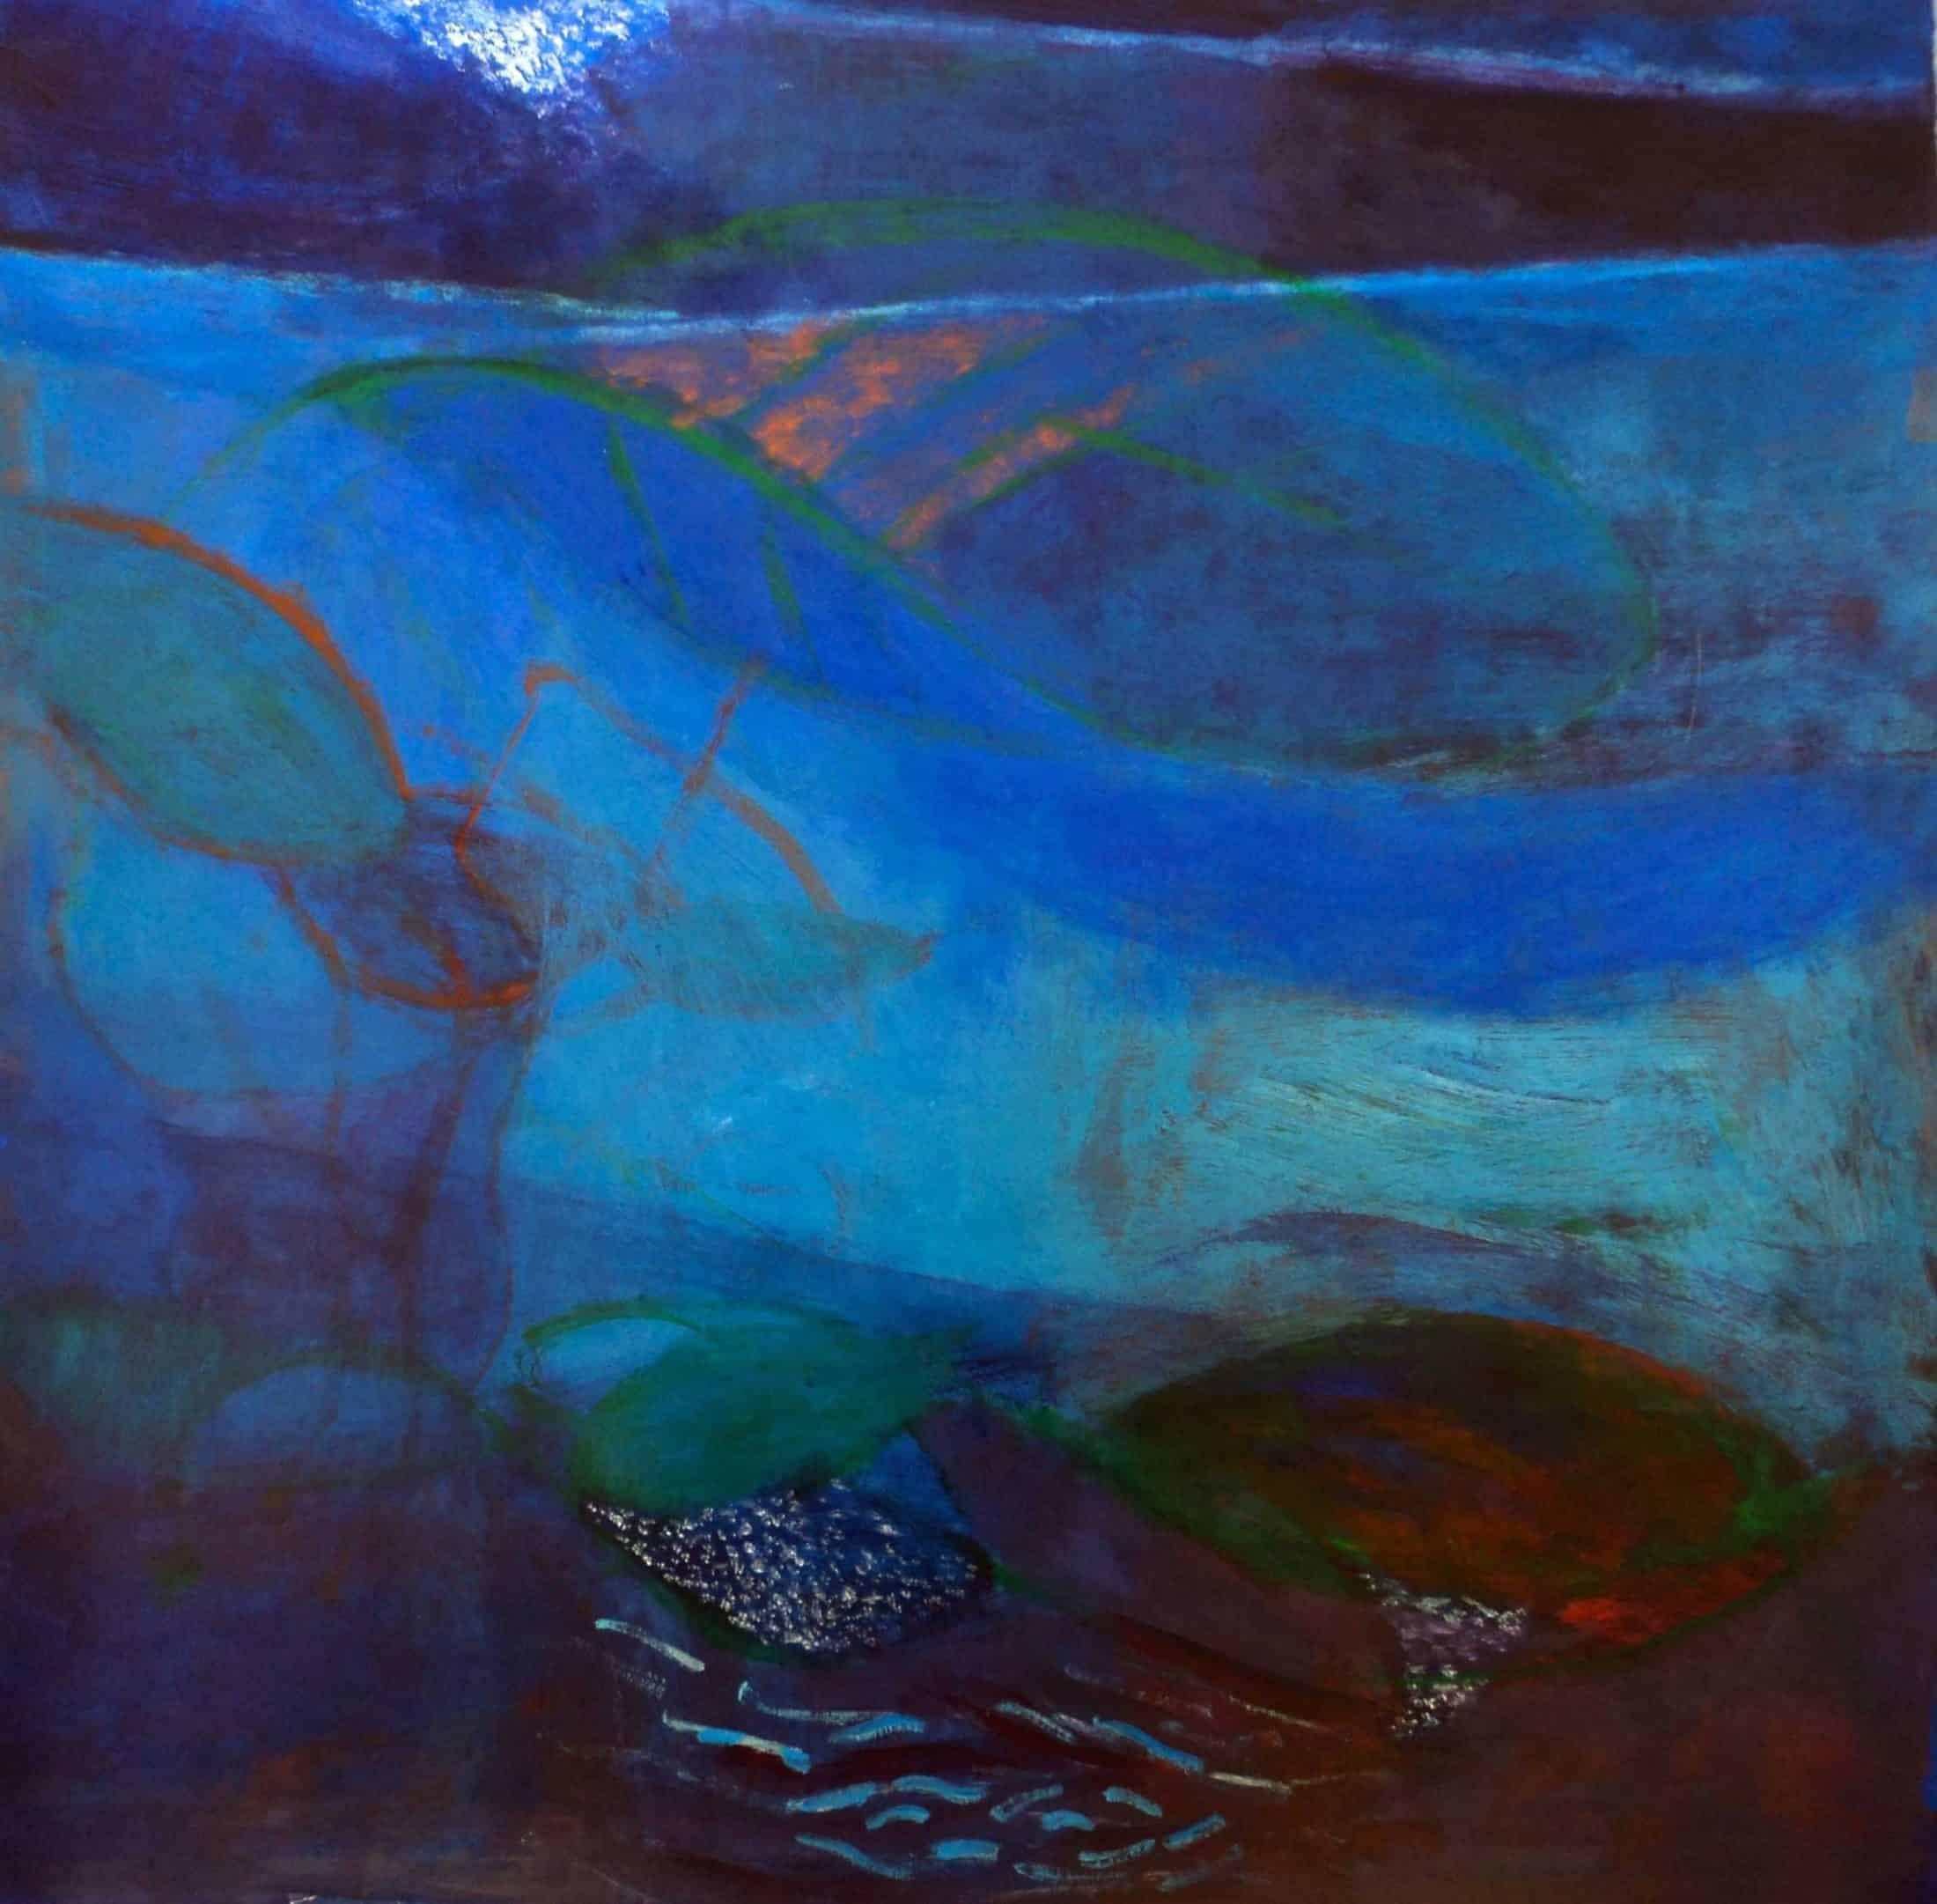 Heidi Daub, Hum of the Sea, 2014, acrylic on paper, 21 ½ x 21 ½ inches